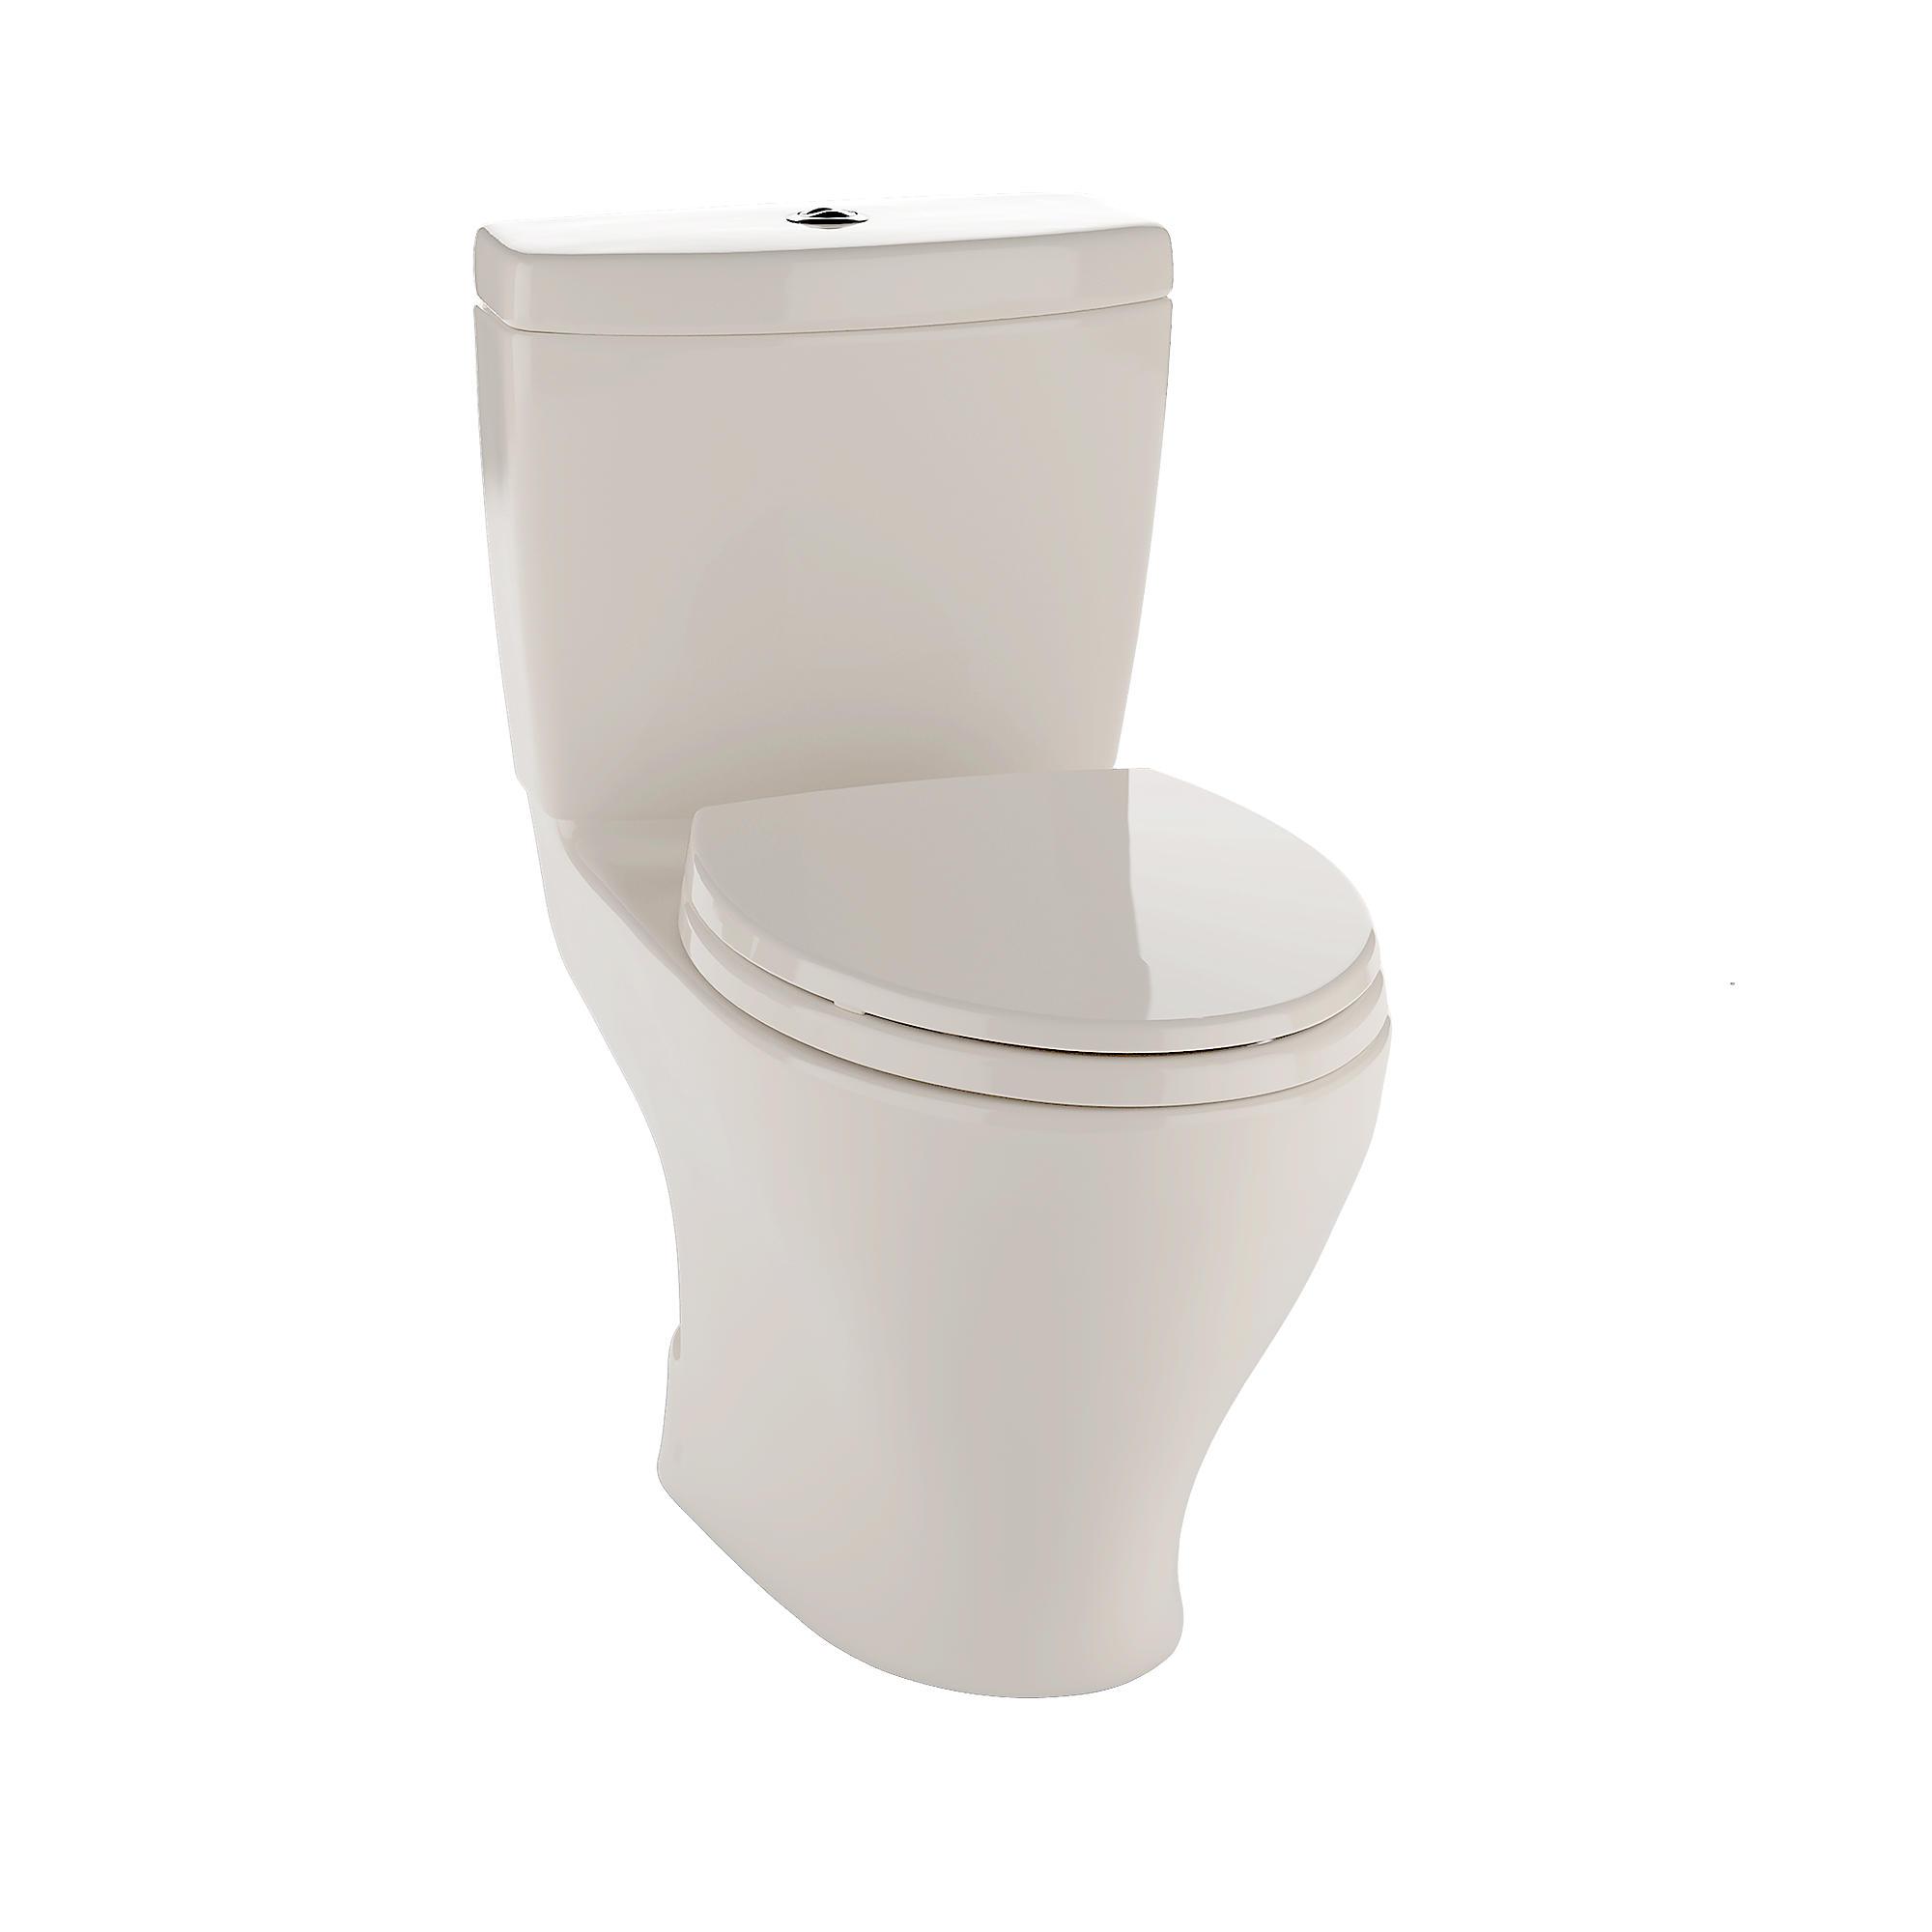 Cst416m 12 aquia ii dual flush two piece toilet  1 6 gpf   0 9 gpf  elongated bowl 0